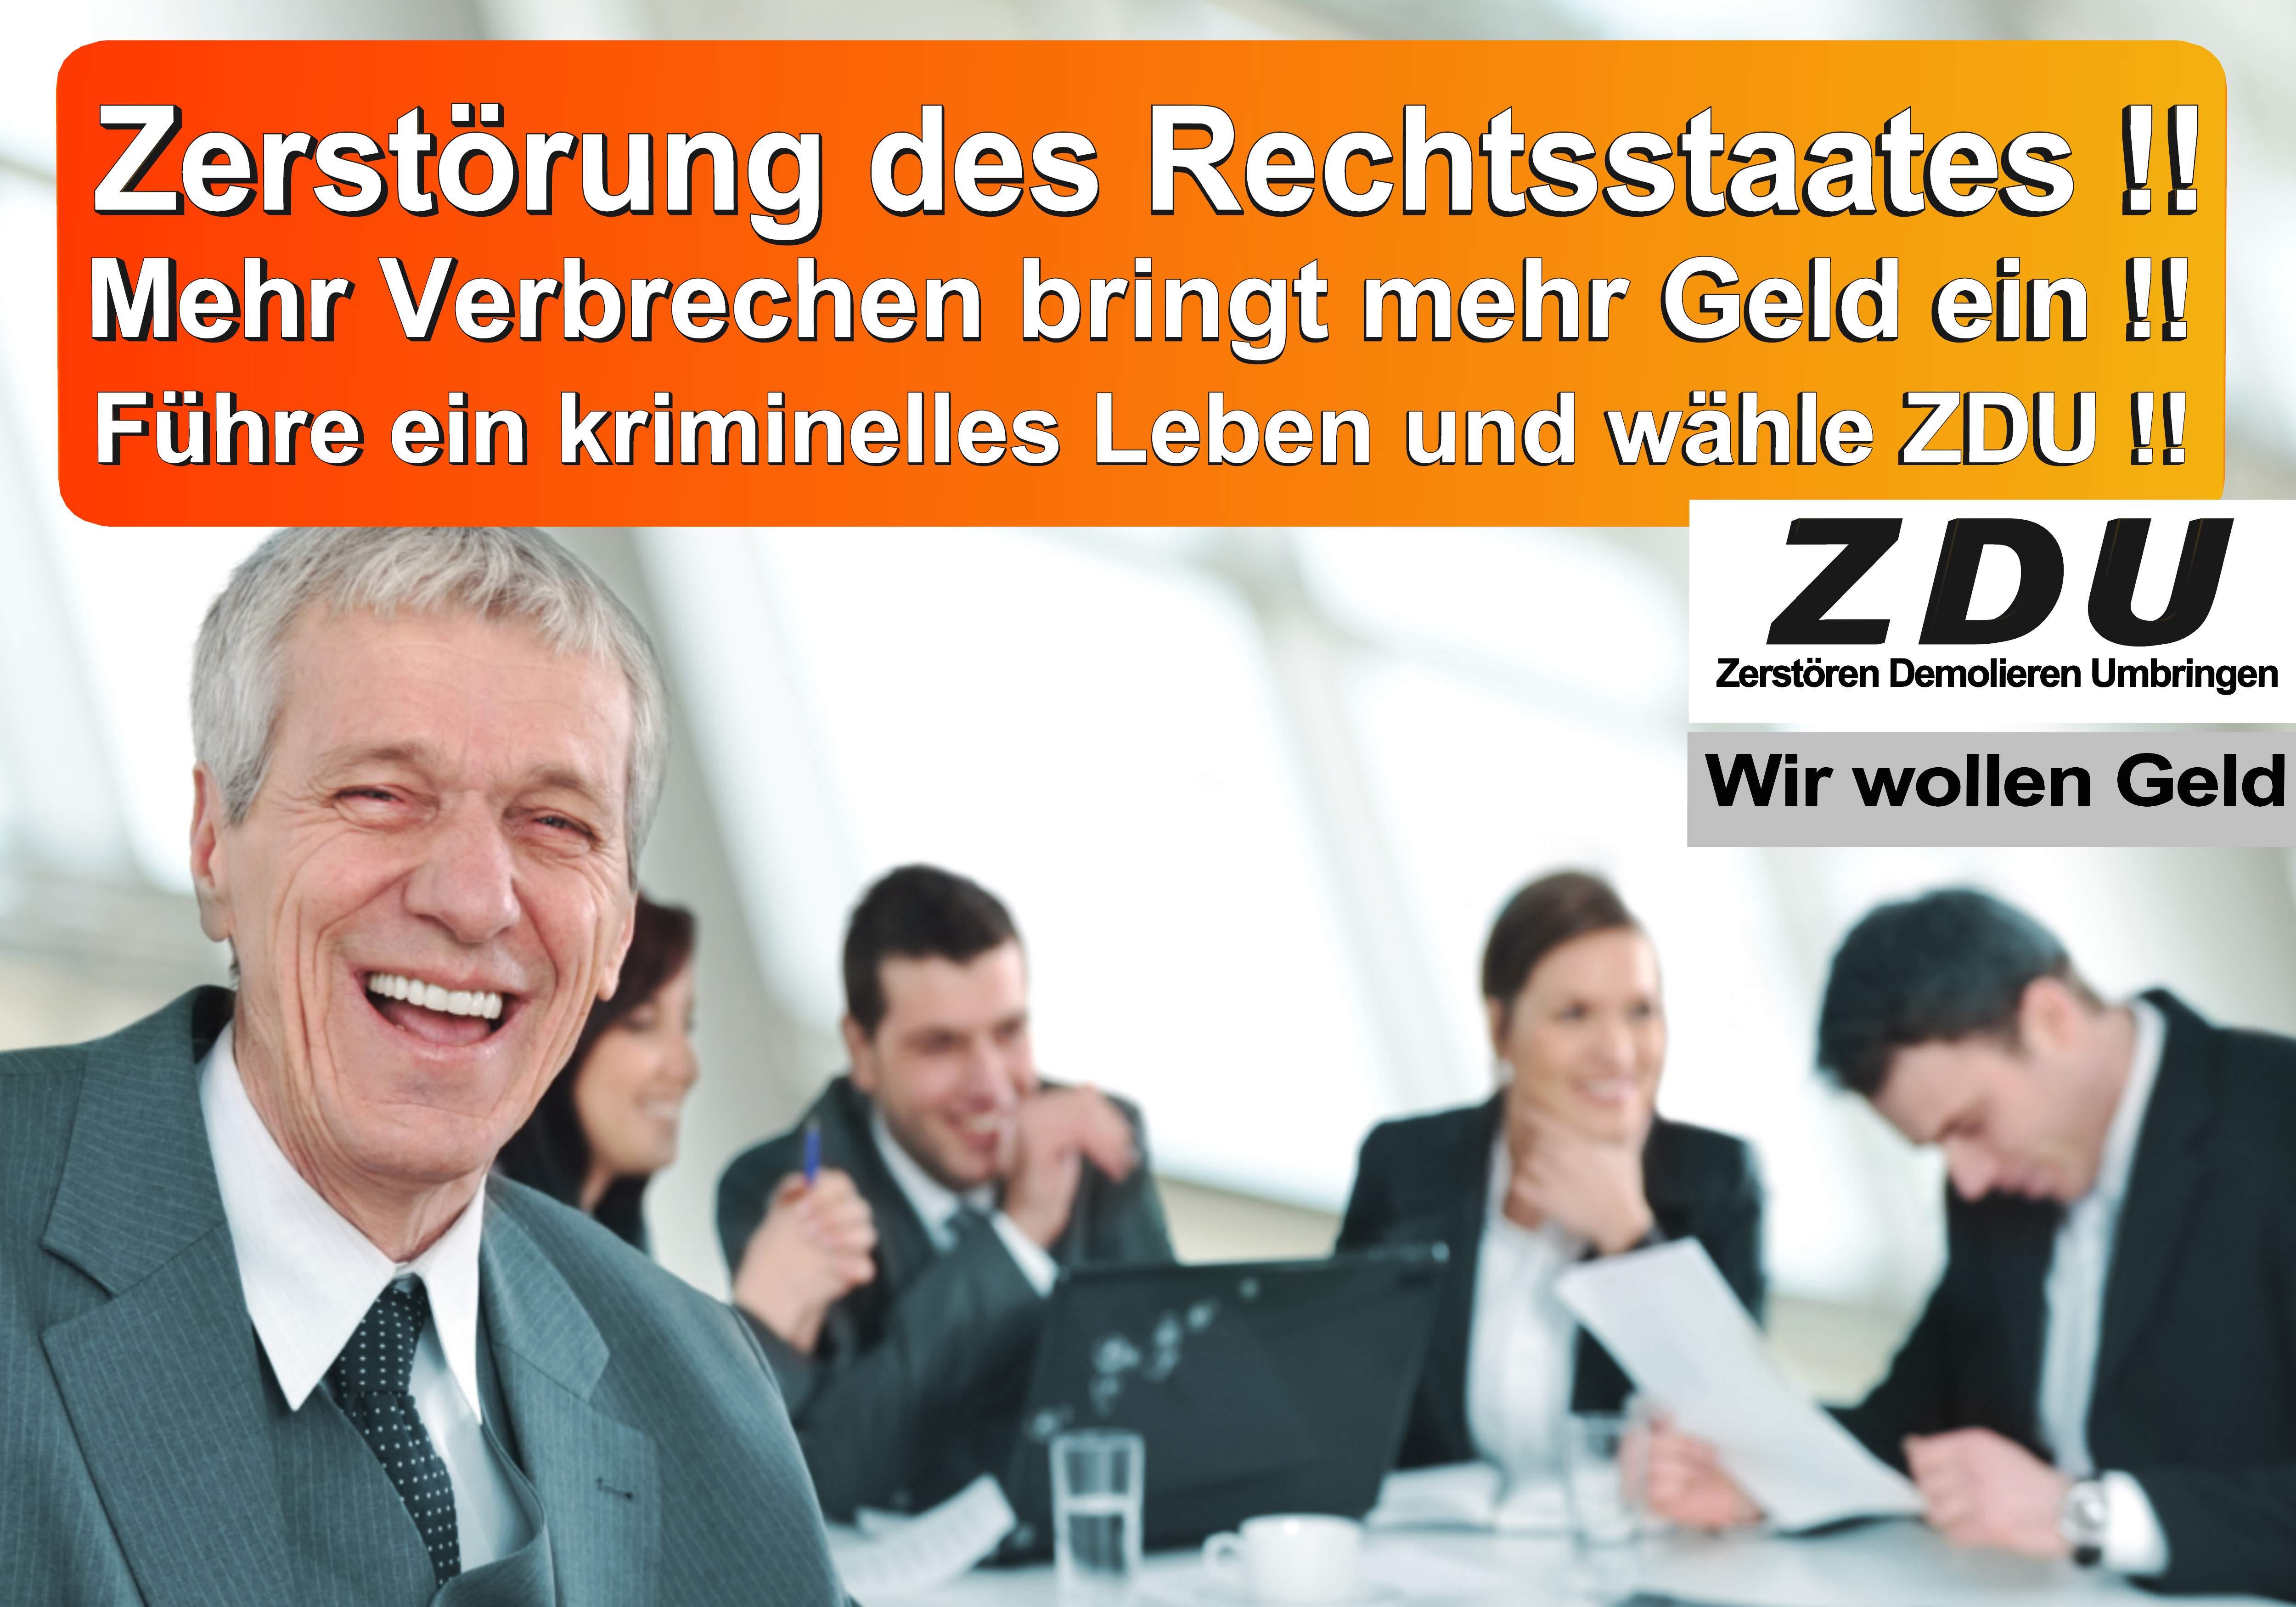 Bundestagswahl 2017 CDU SPD AfD Wahlplakat Angela Merkel CDU CSU (20)